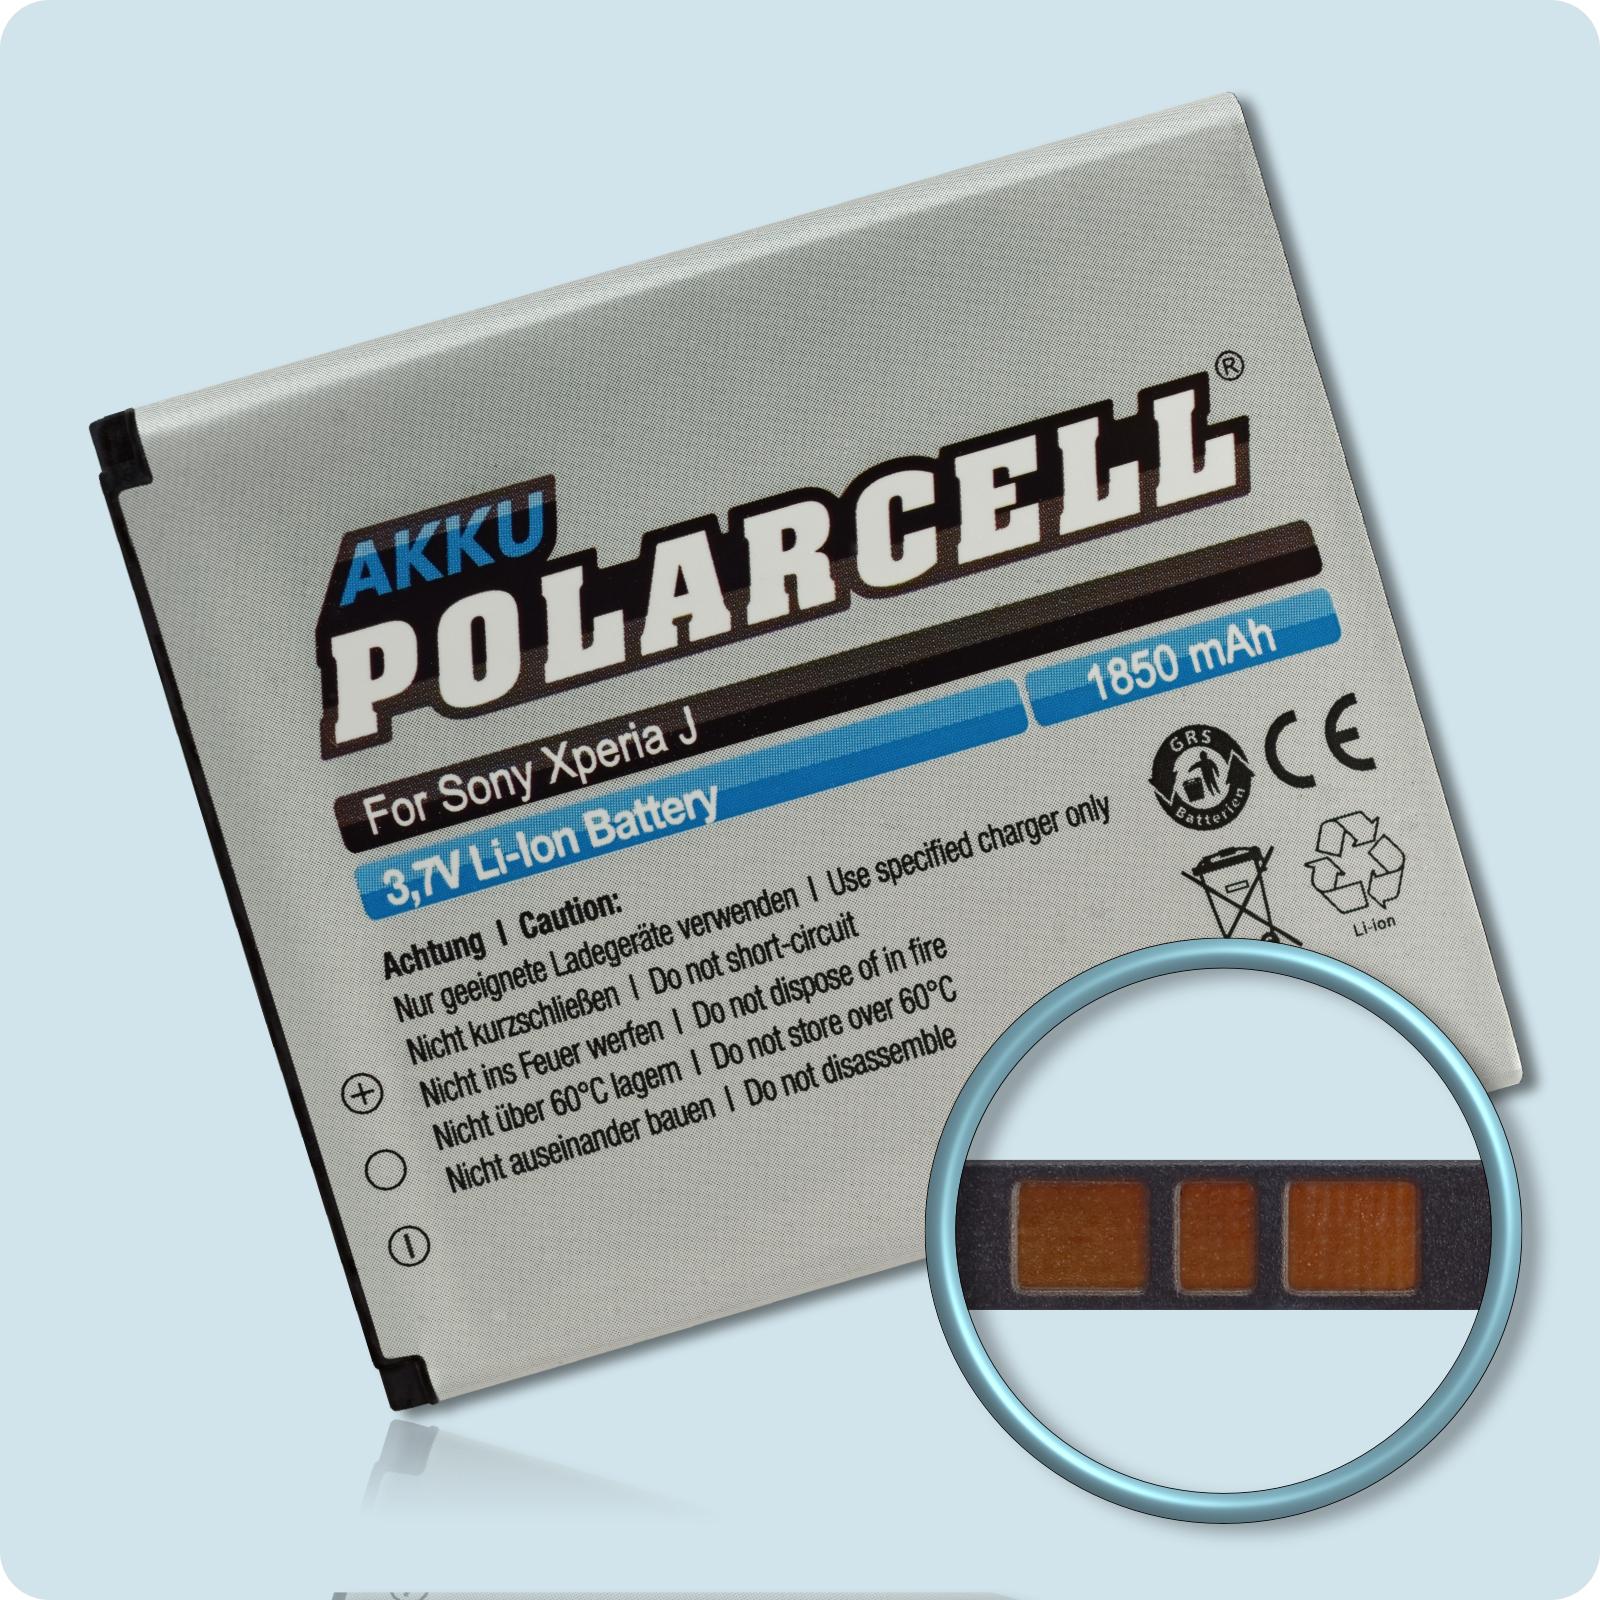 PolarCell® Hochleistungsakku für Sony Xperia E1 Dual, ersetzt Originalakku BA900